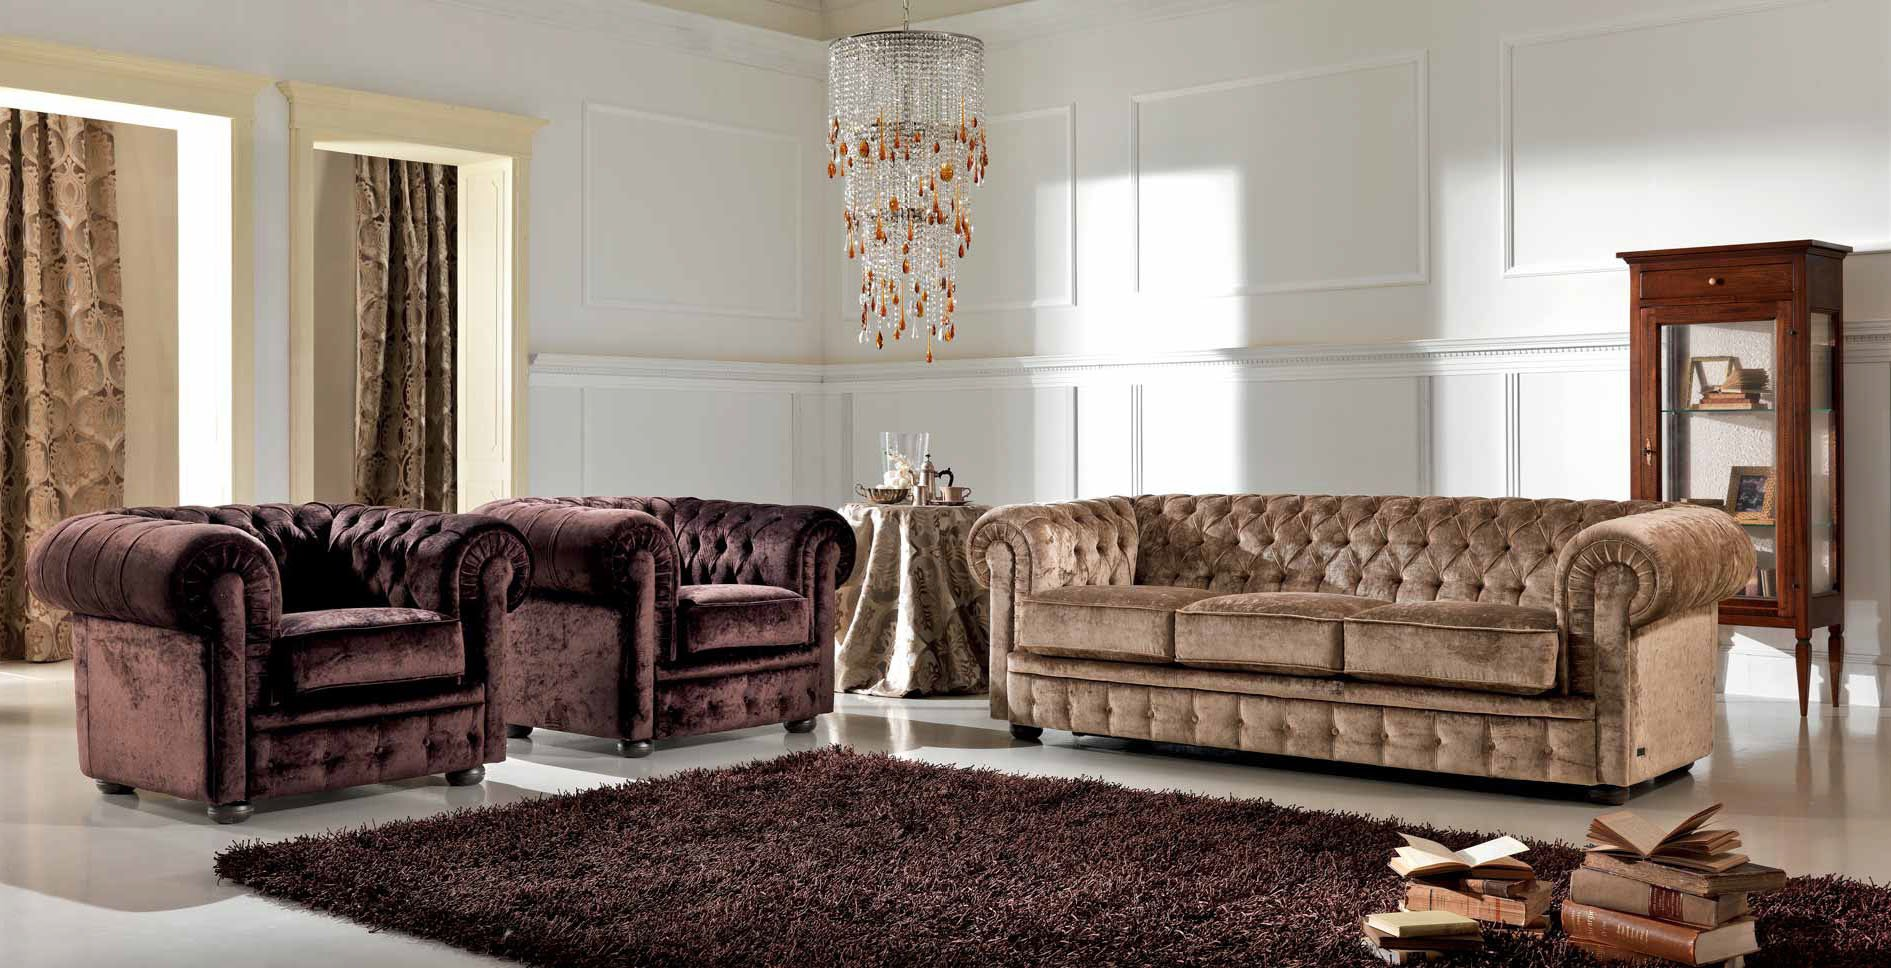 Chester комплект мягкой мебели 89070